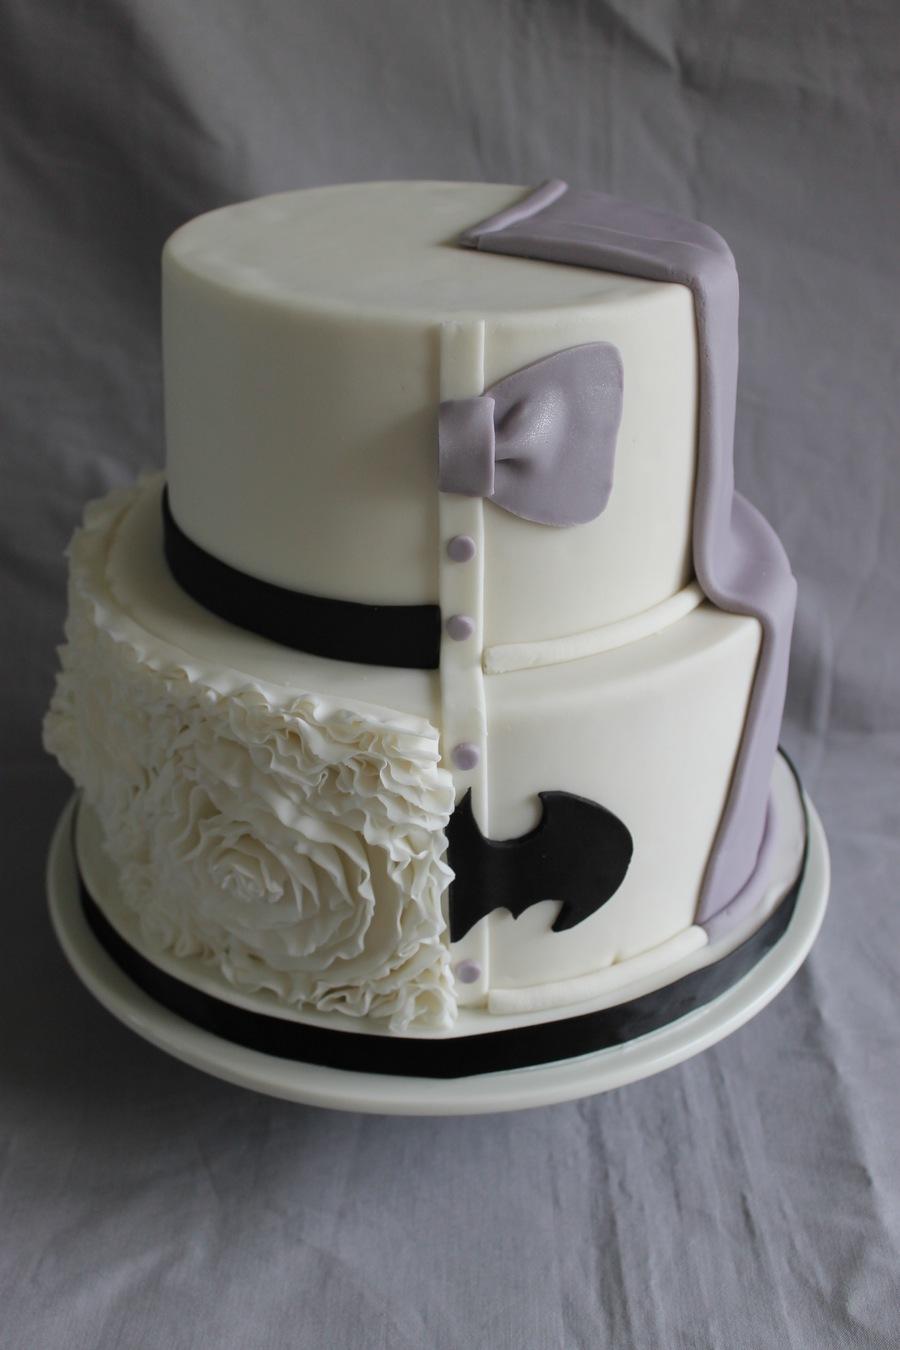 ICqg1I2bgU-half-bride-groom-cake_900.jpg